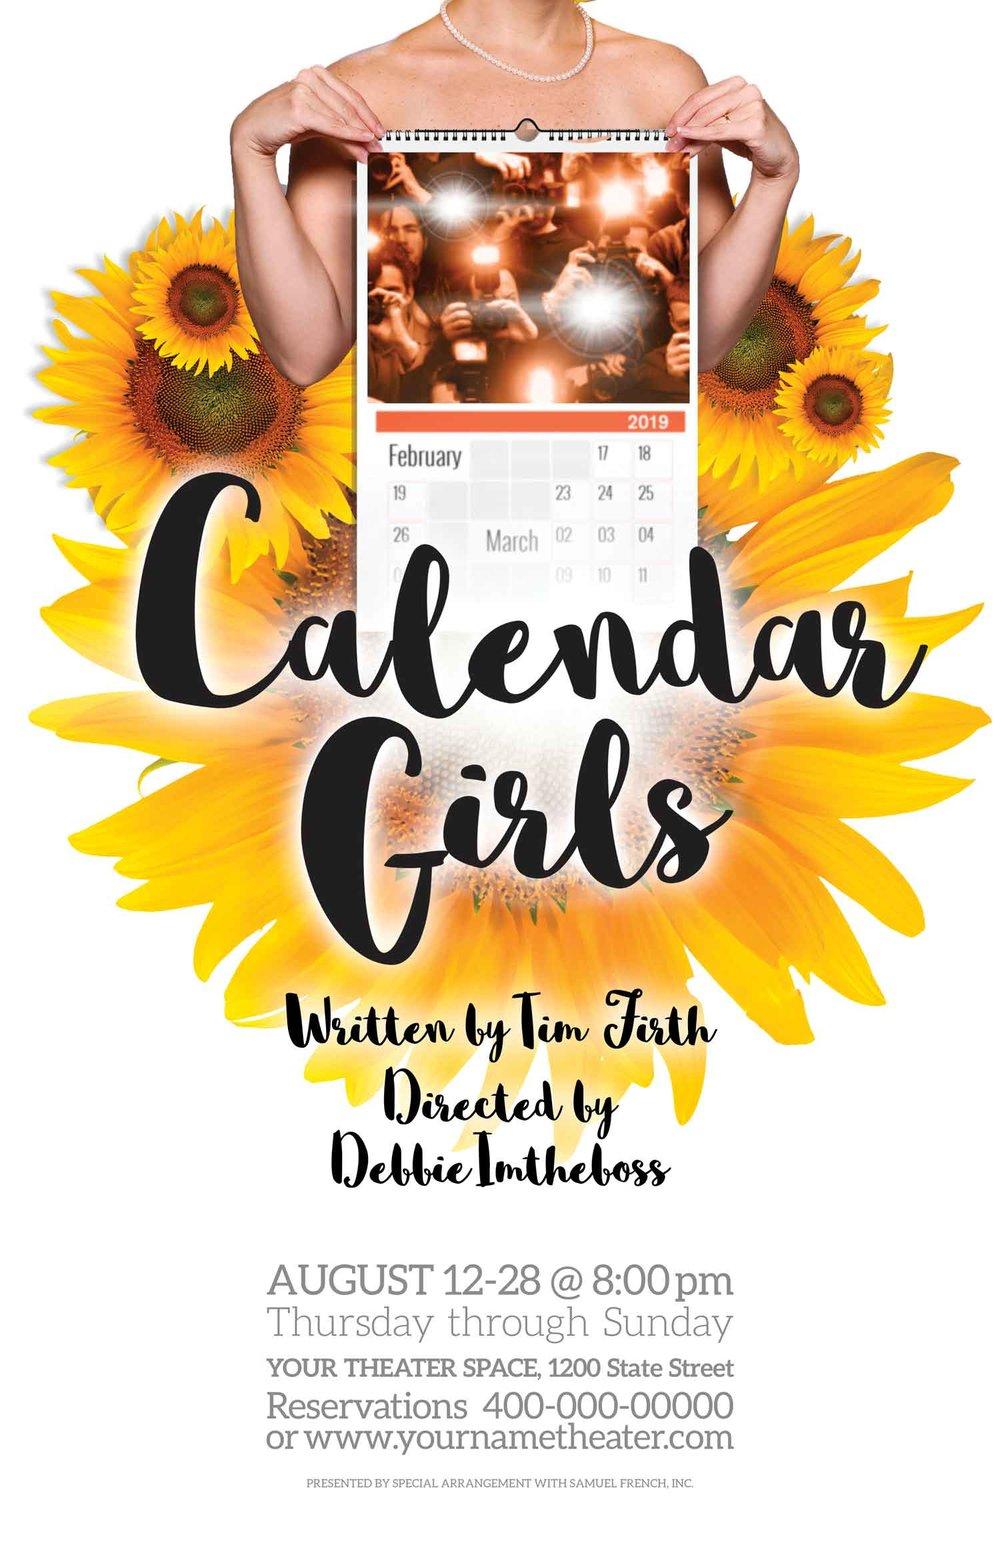 Drama-Queen-Graphics-Calendar-Girls-posters_rd1_low.jpg